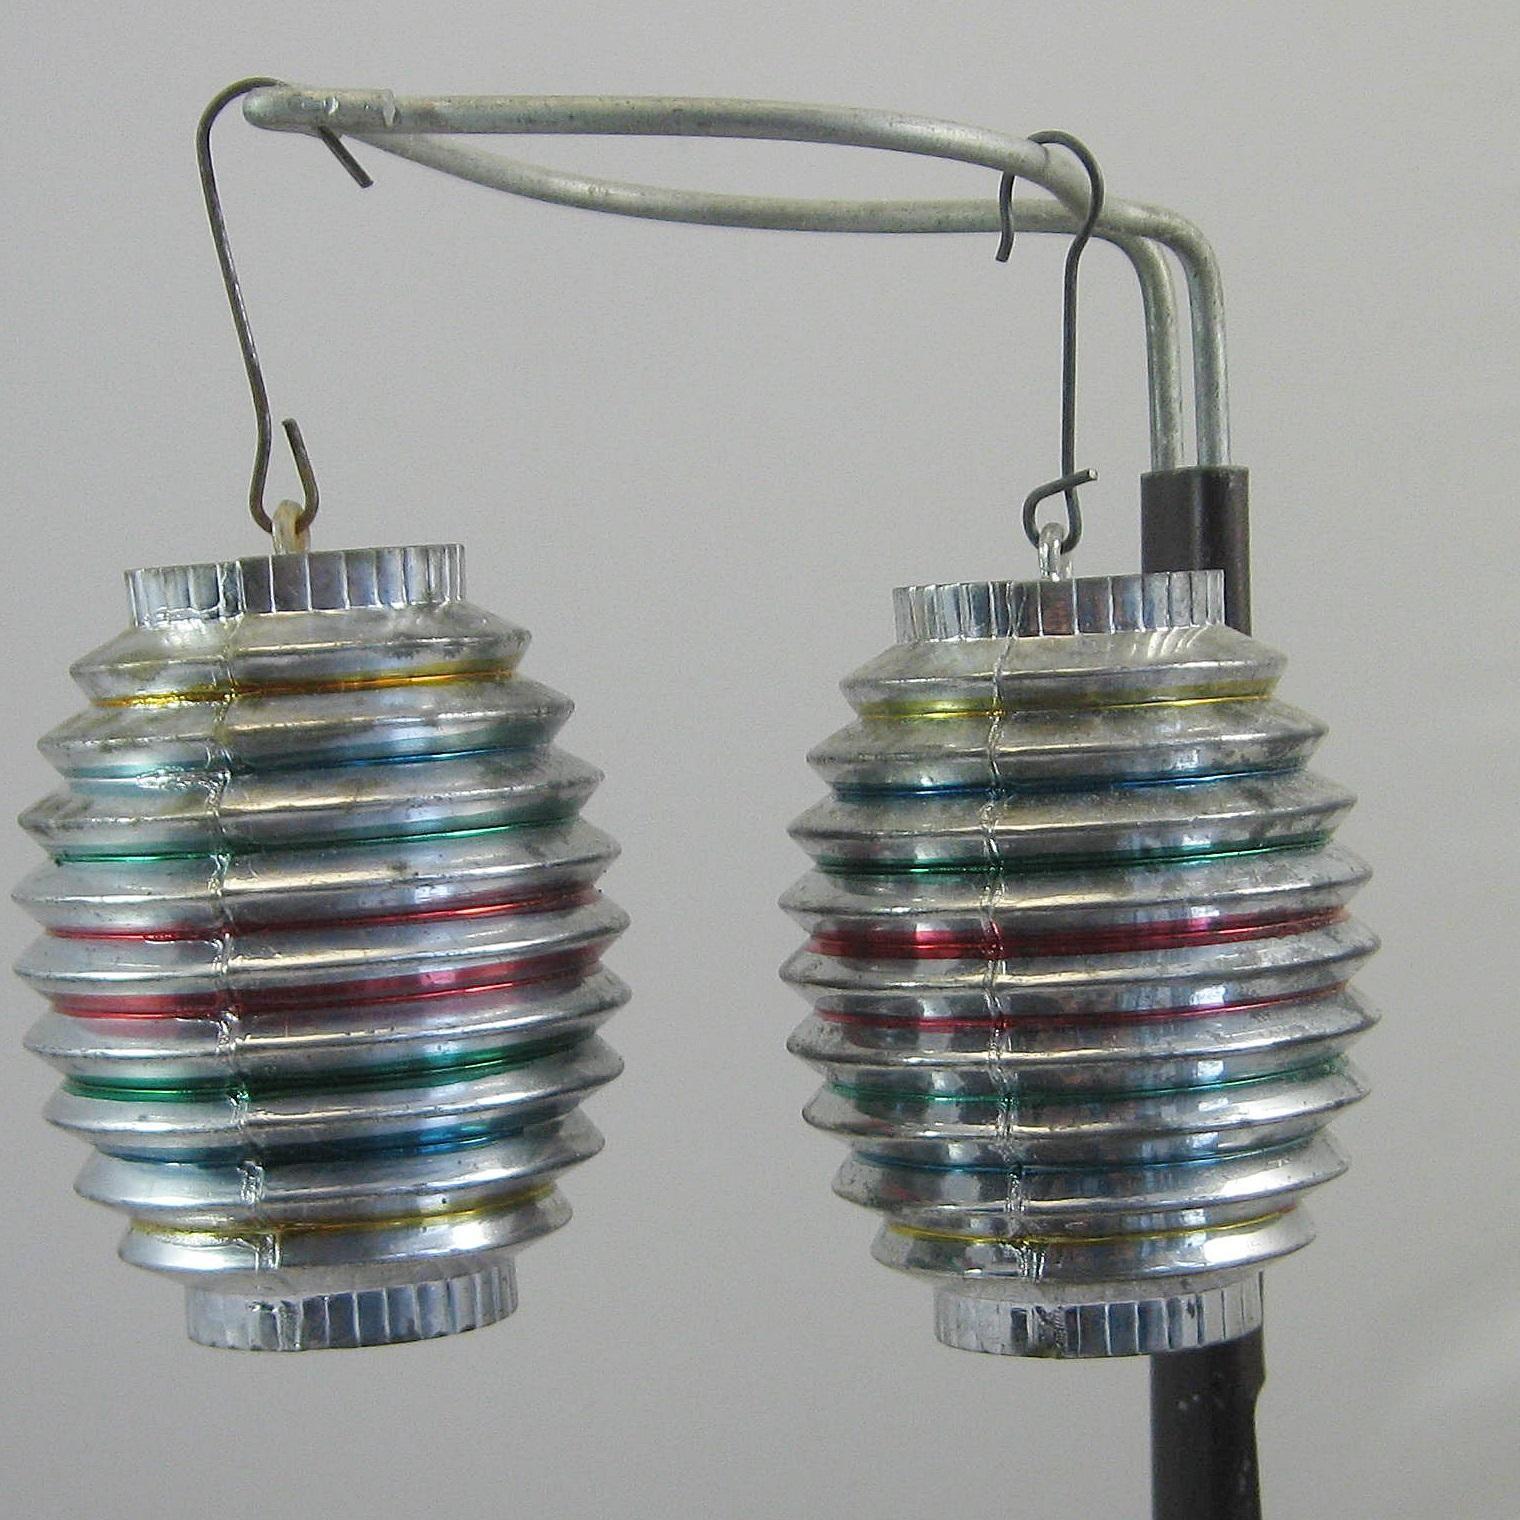 Pin on Cousins Antiques - My Online Shop